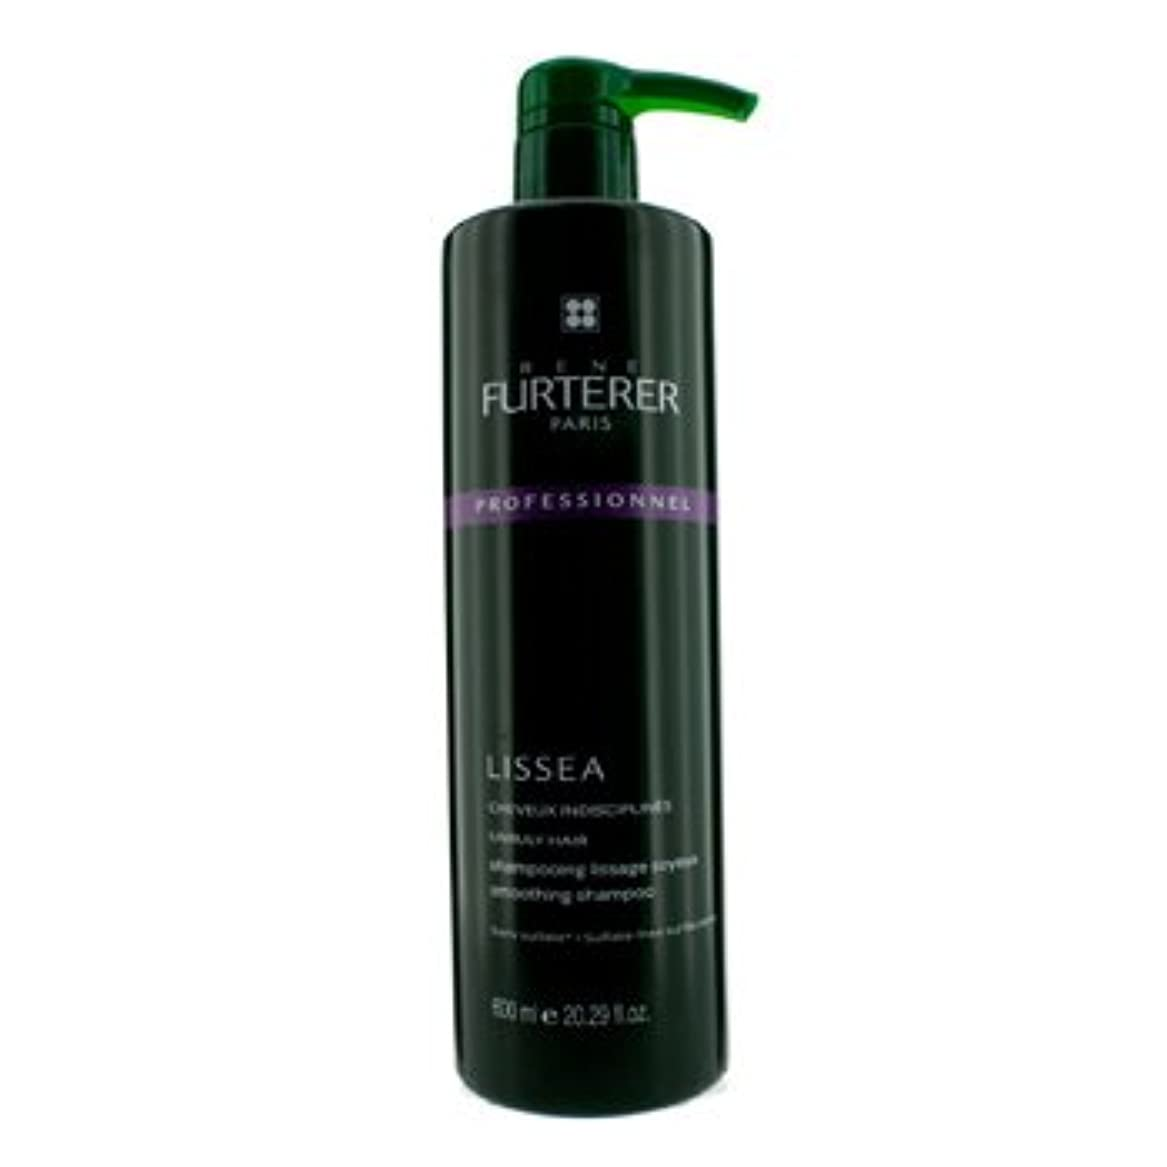 [Rene Furterer] Lissea Smoothing Shampoo - For Unruly Hair (Salon Product) 600ml/20.29oz